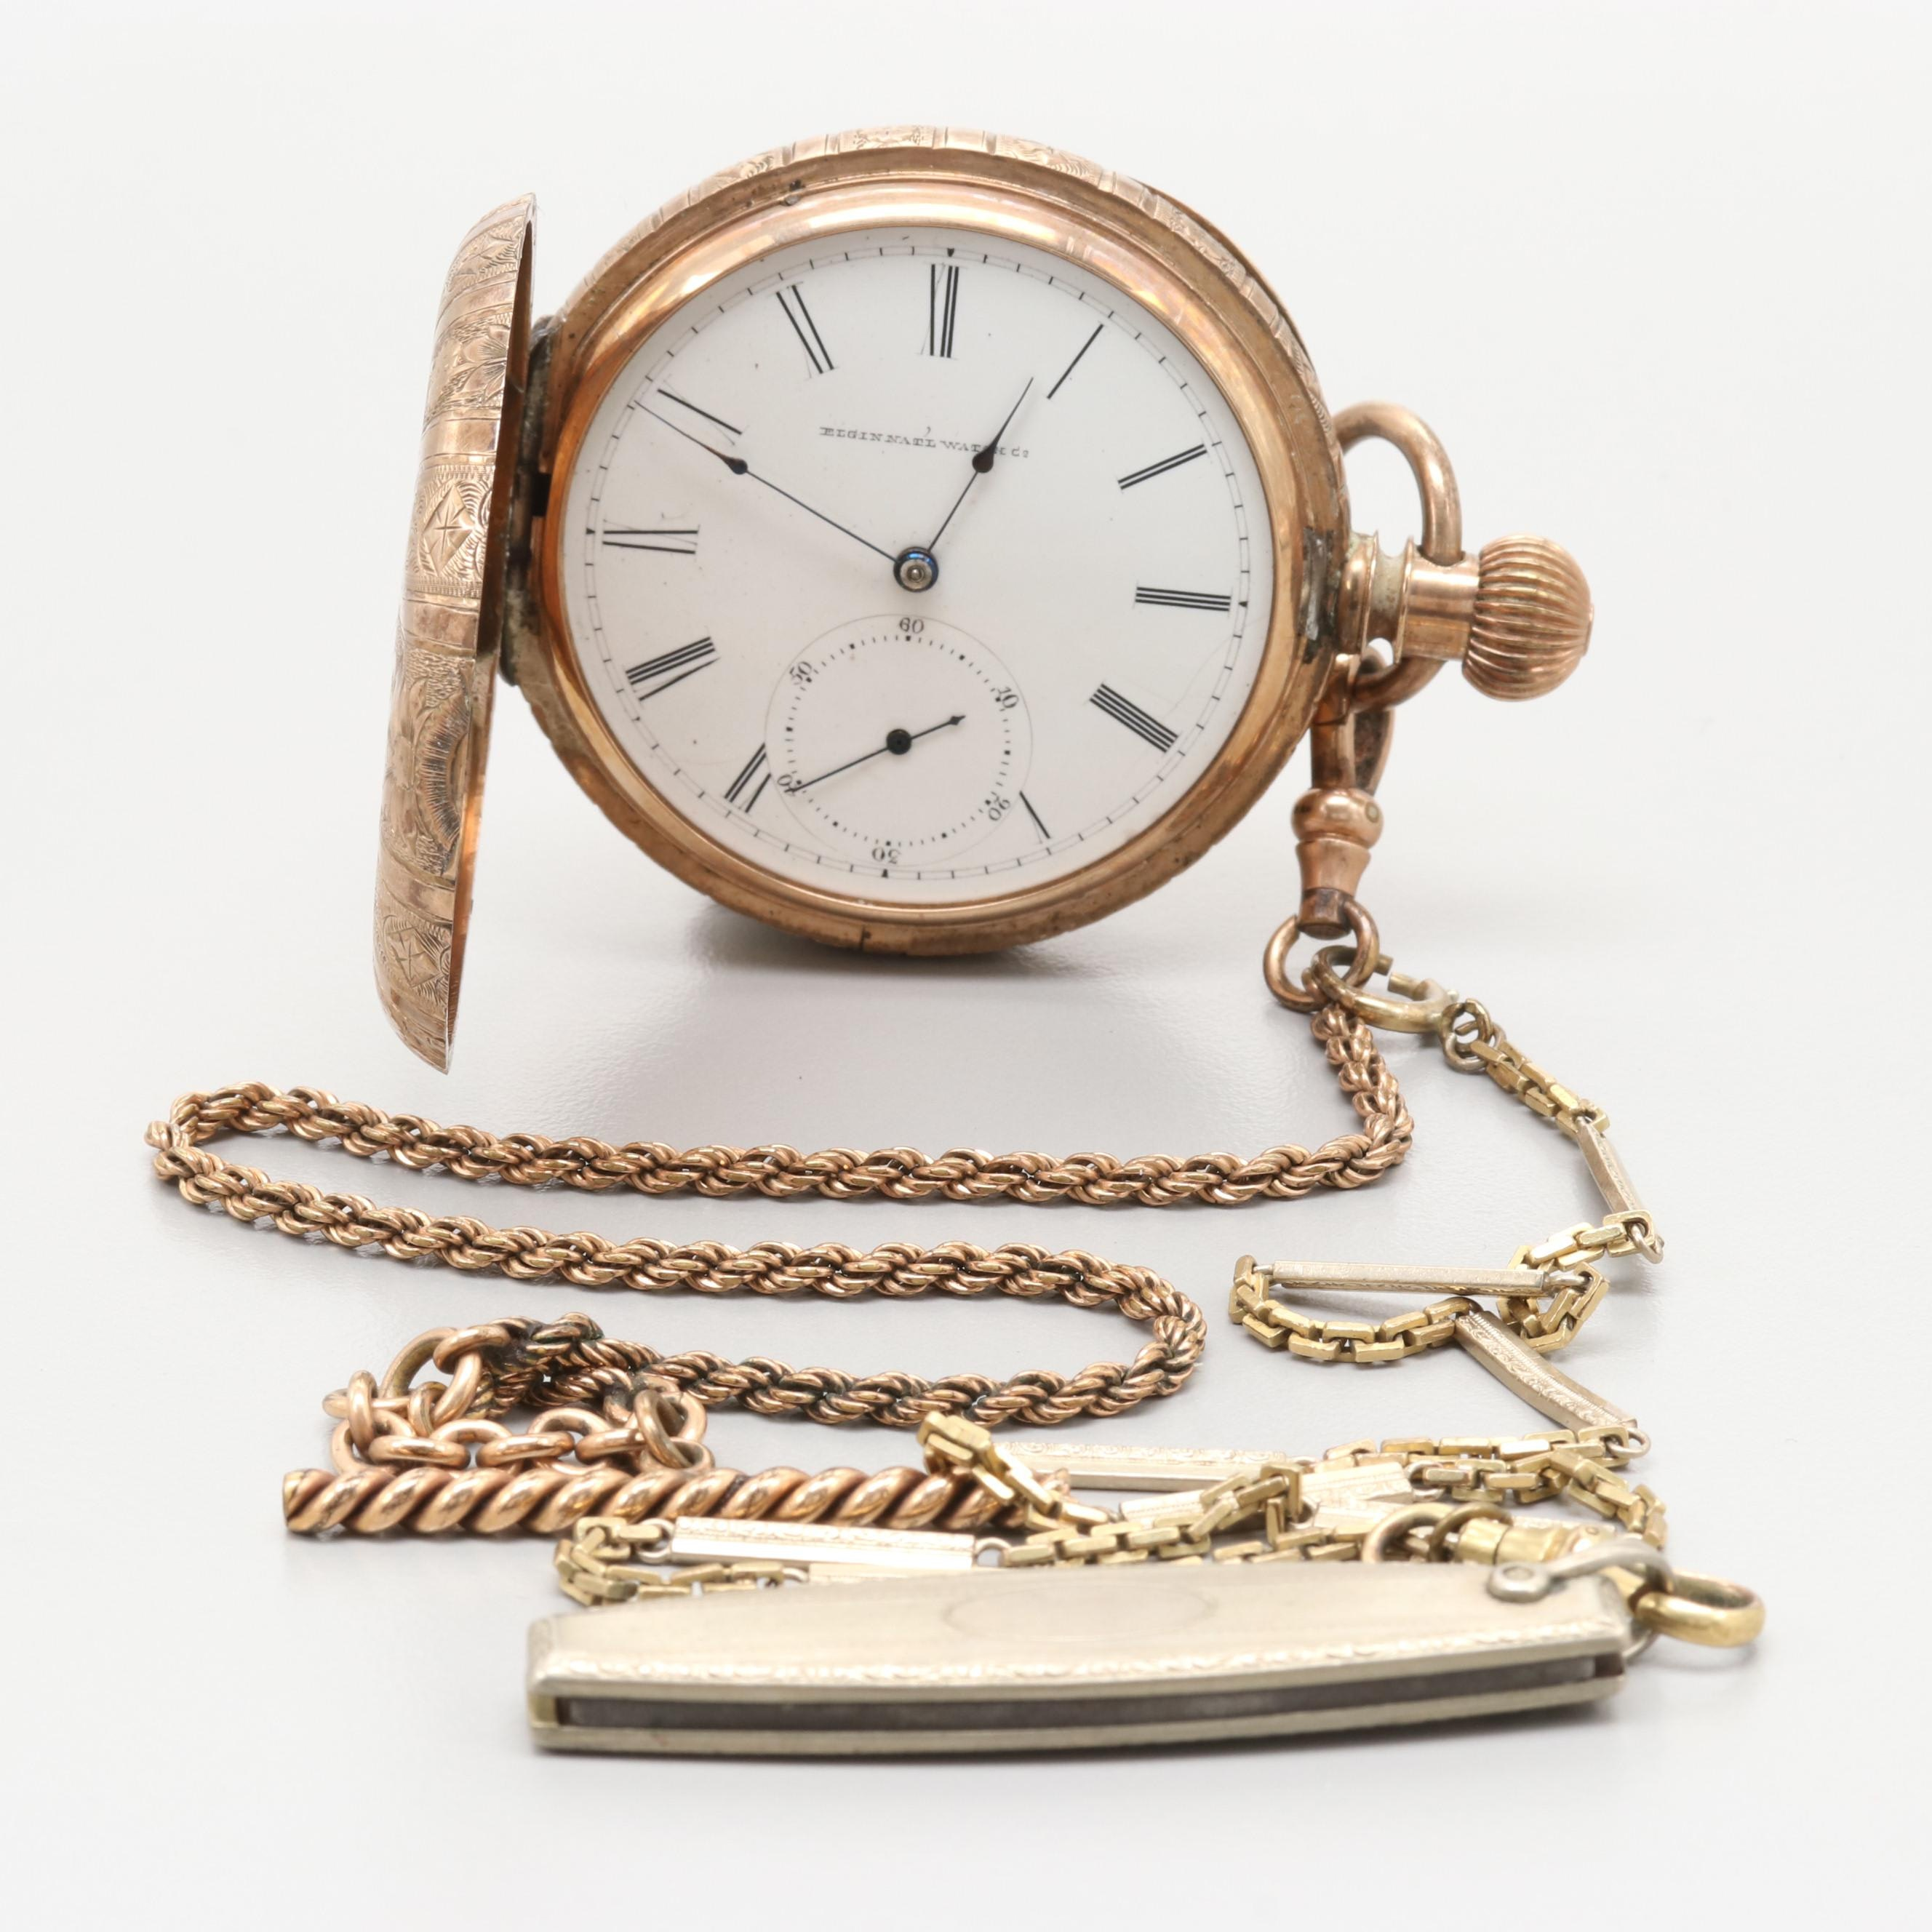 Elgin Hunter Case Pocket Watch, 1882